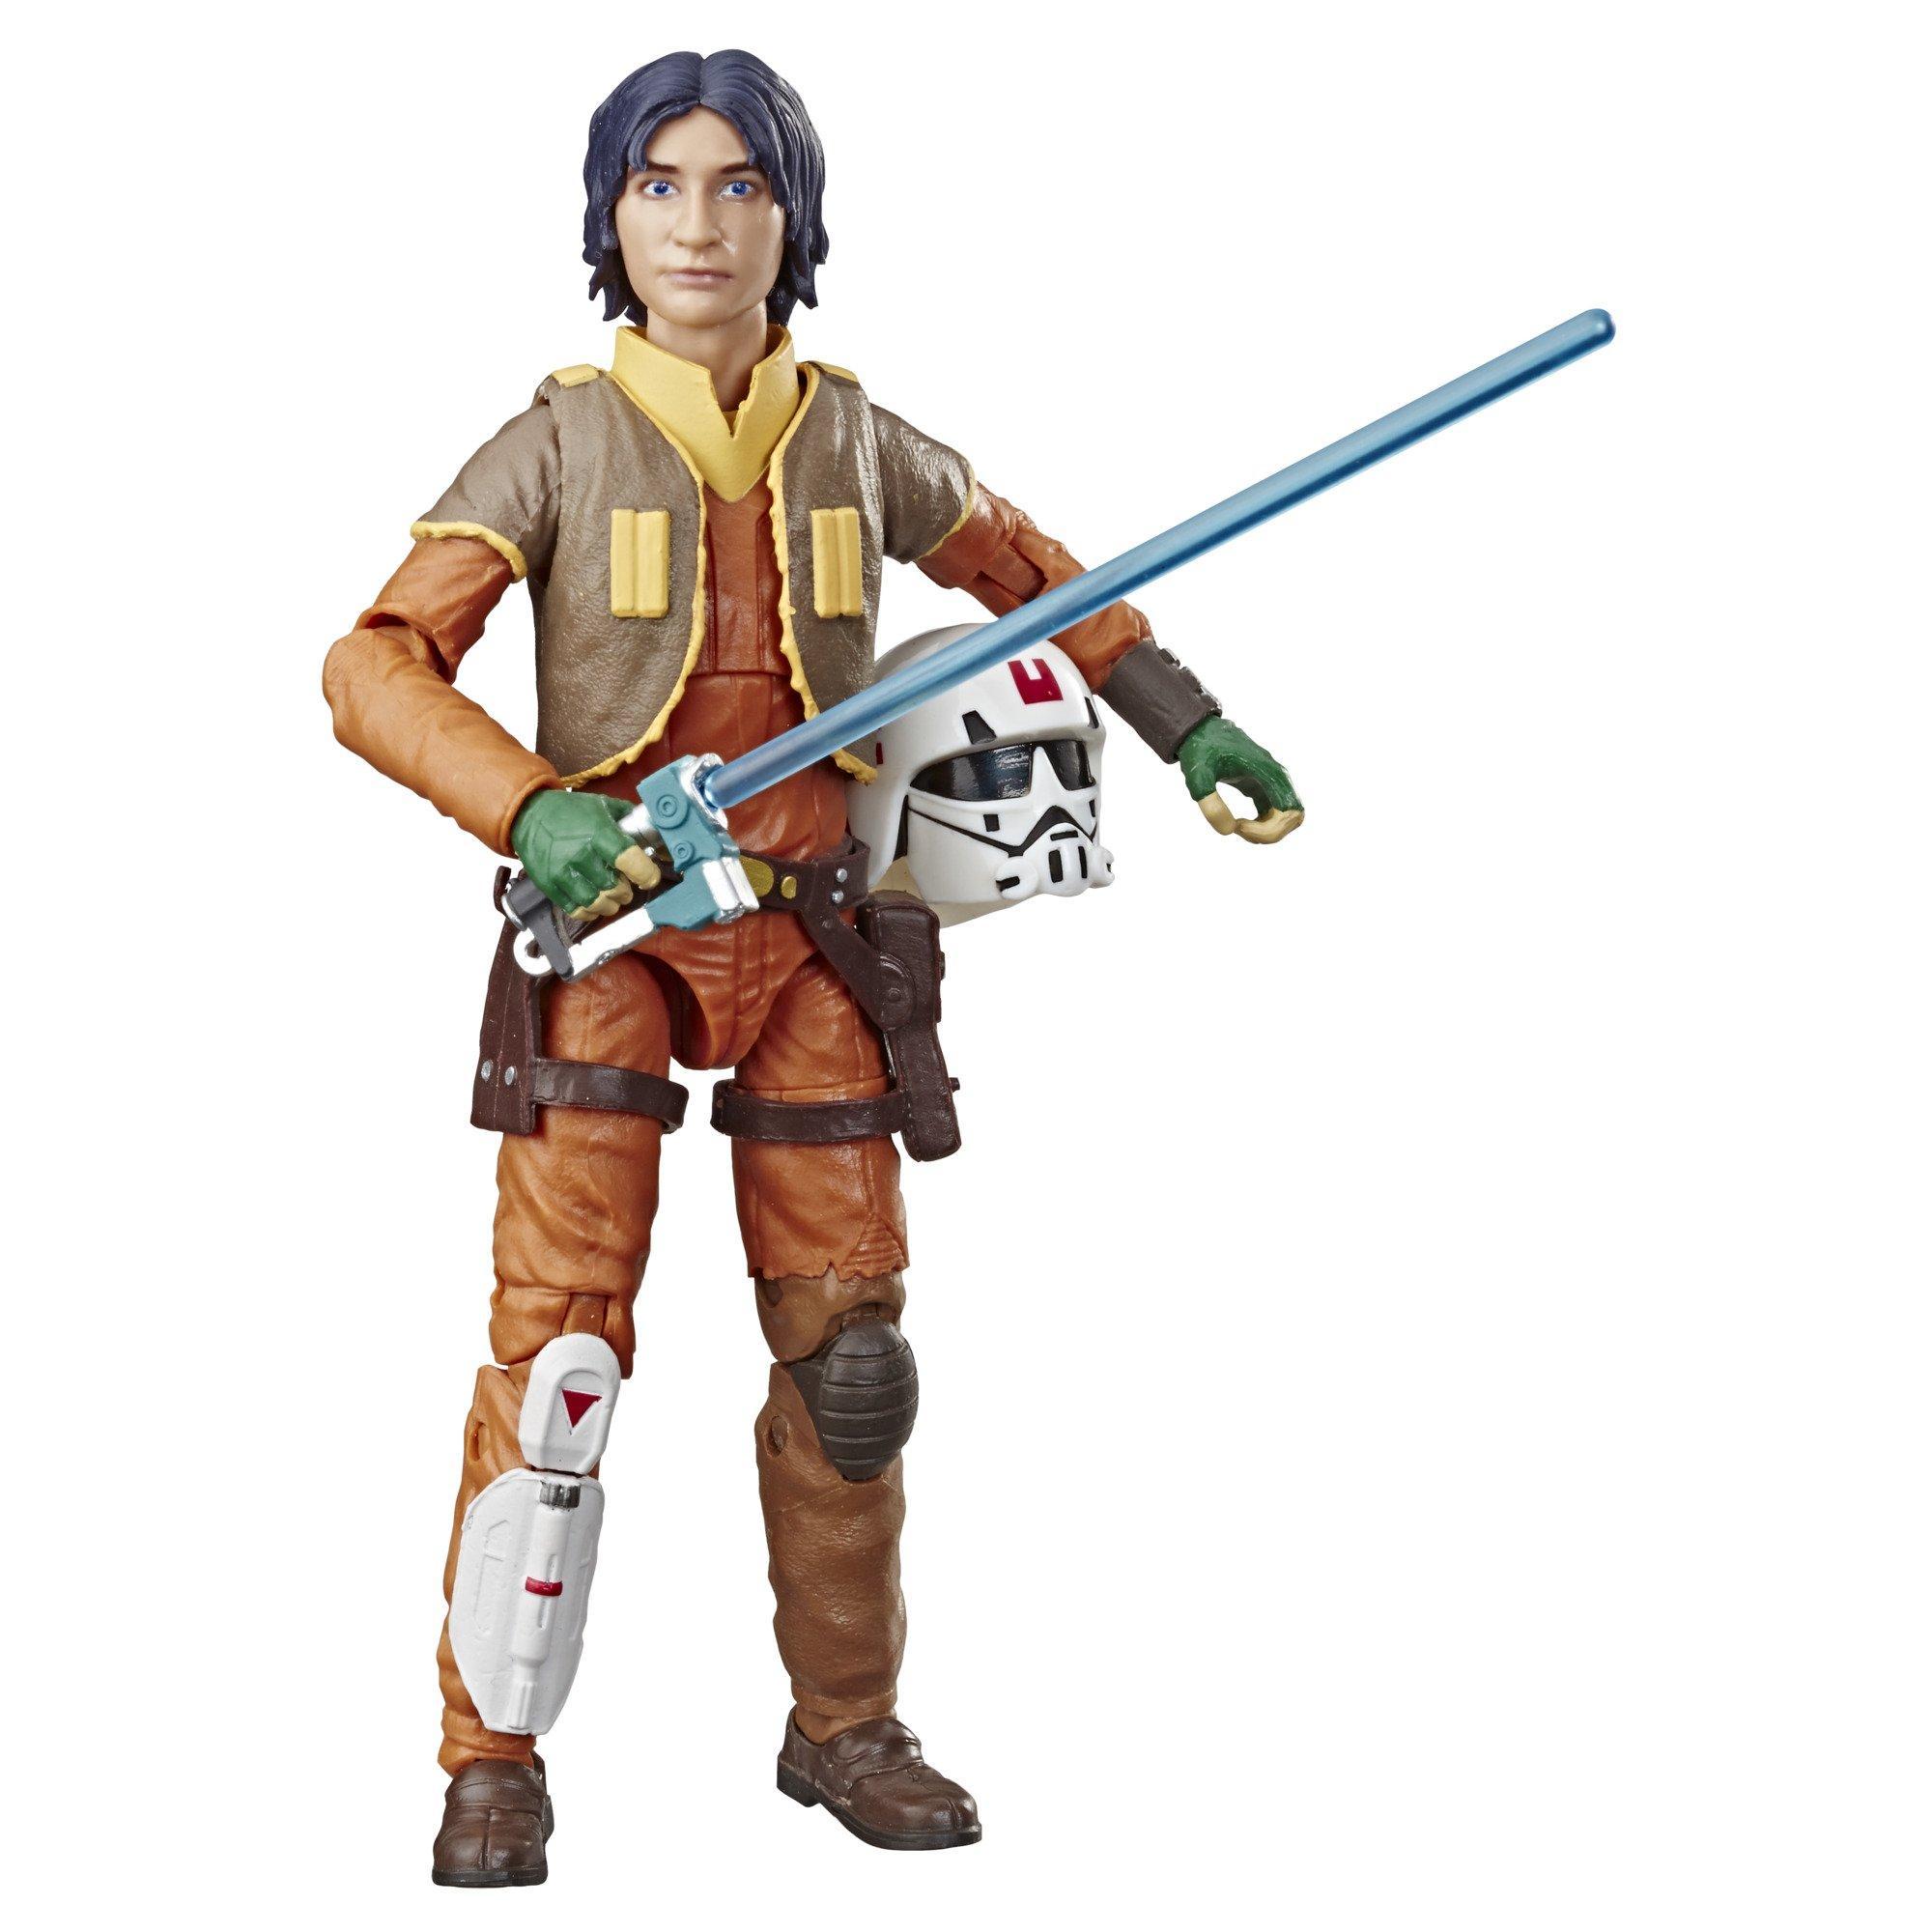 Star Wars Rebels Ezra Bridger The Black Series Action Figure